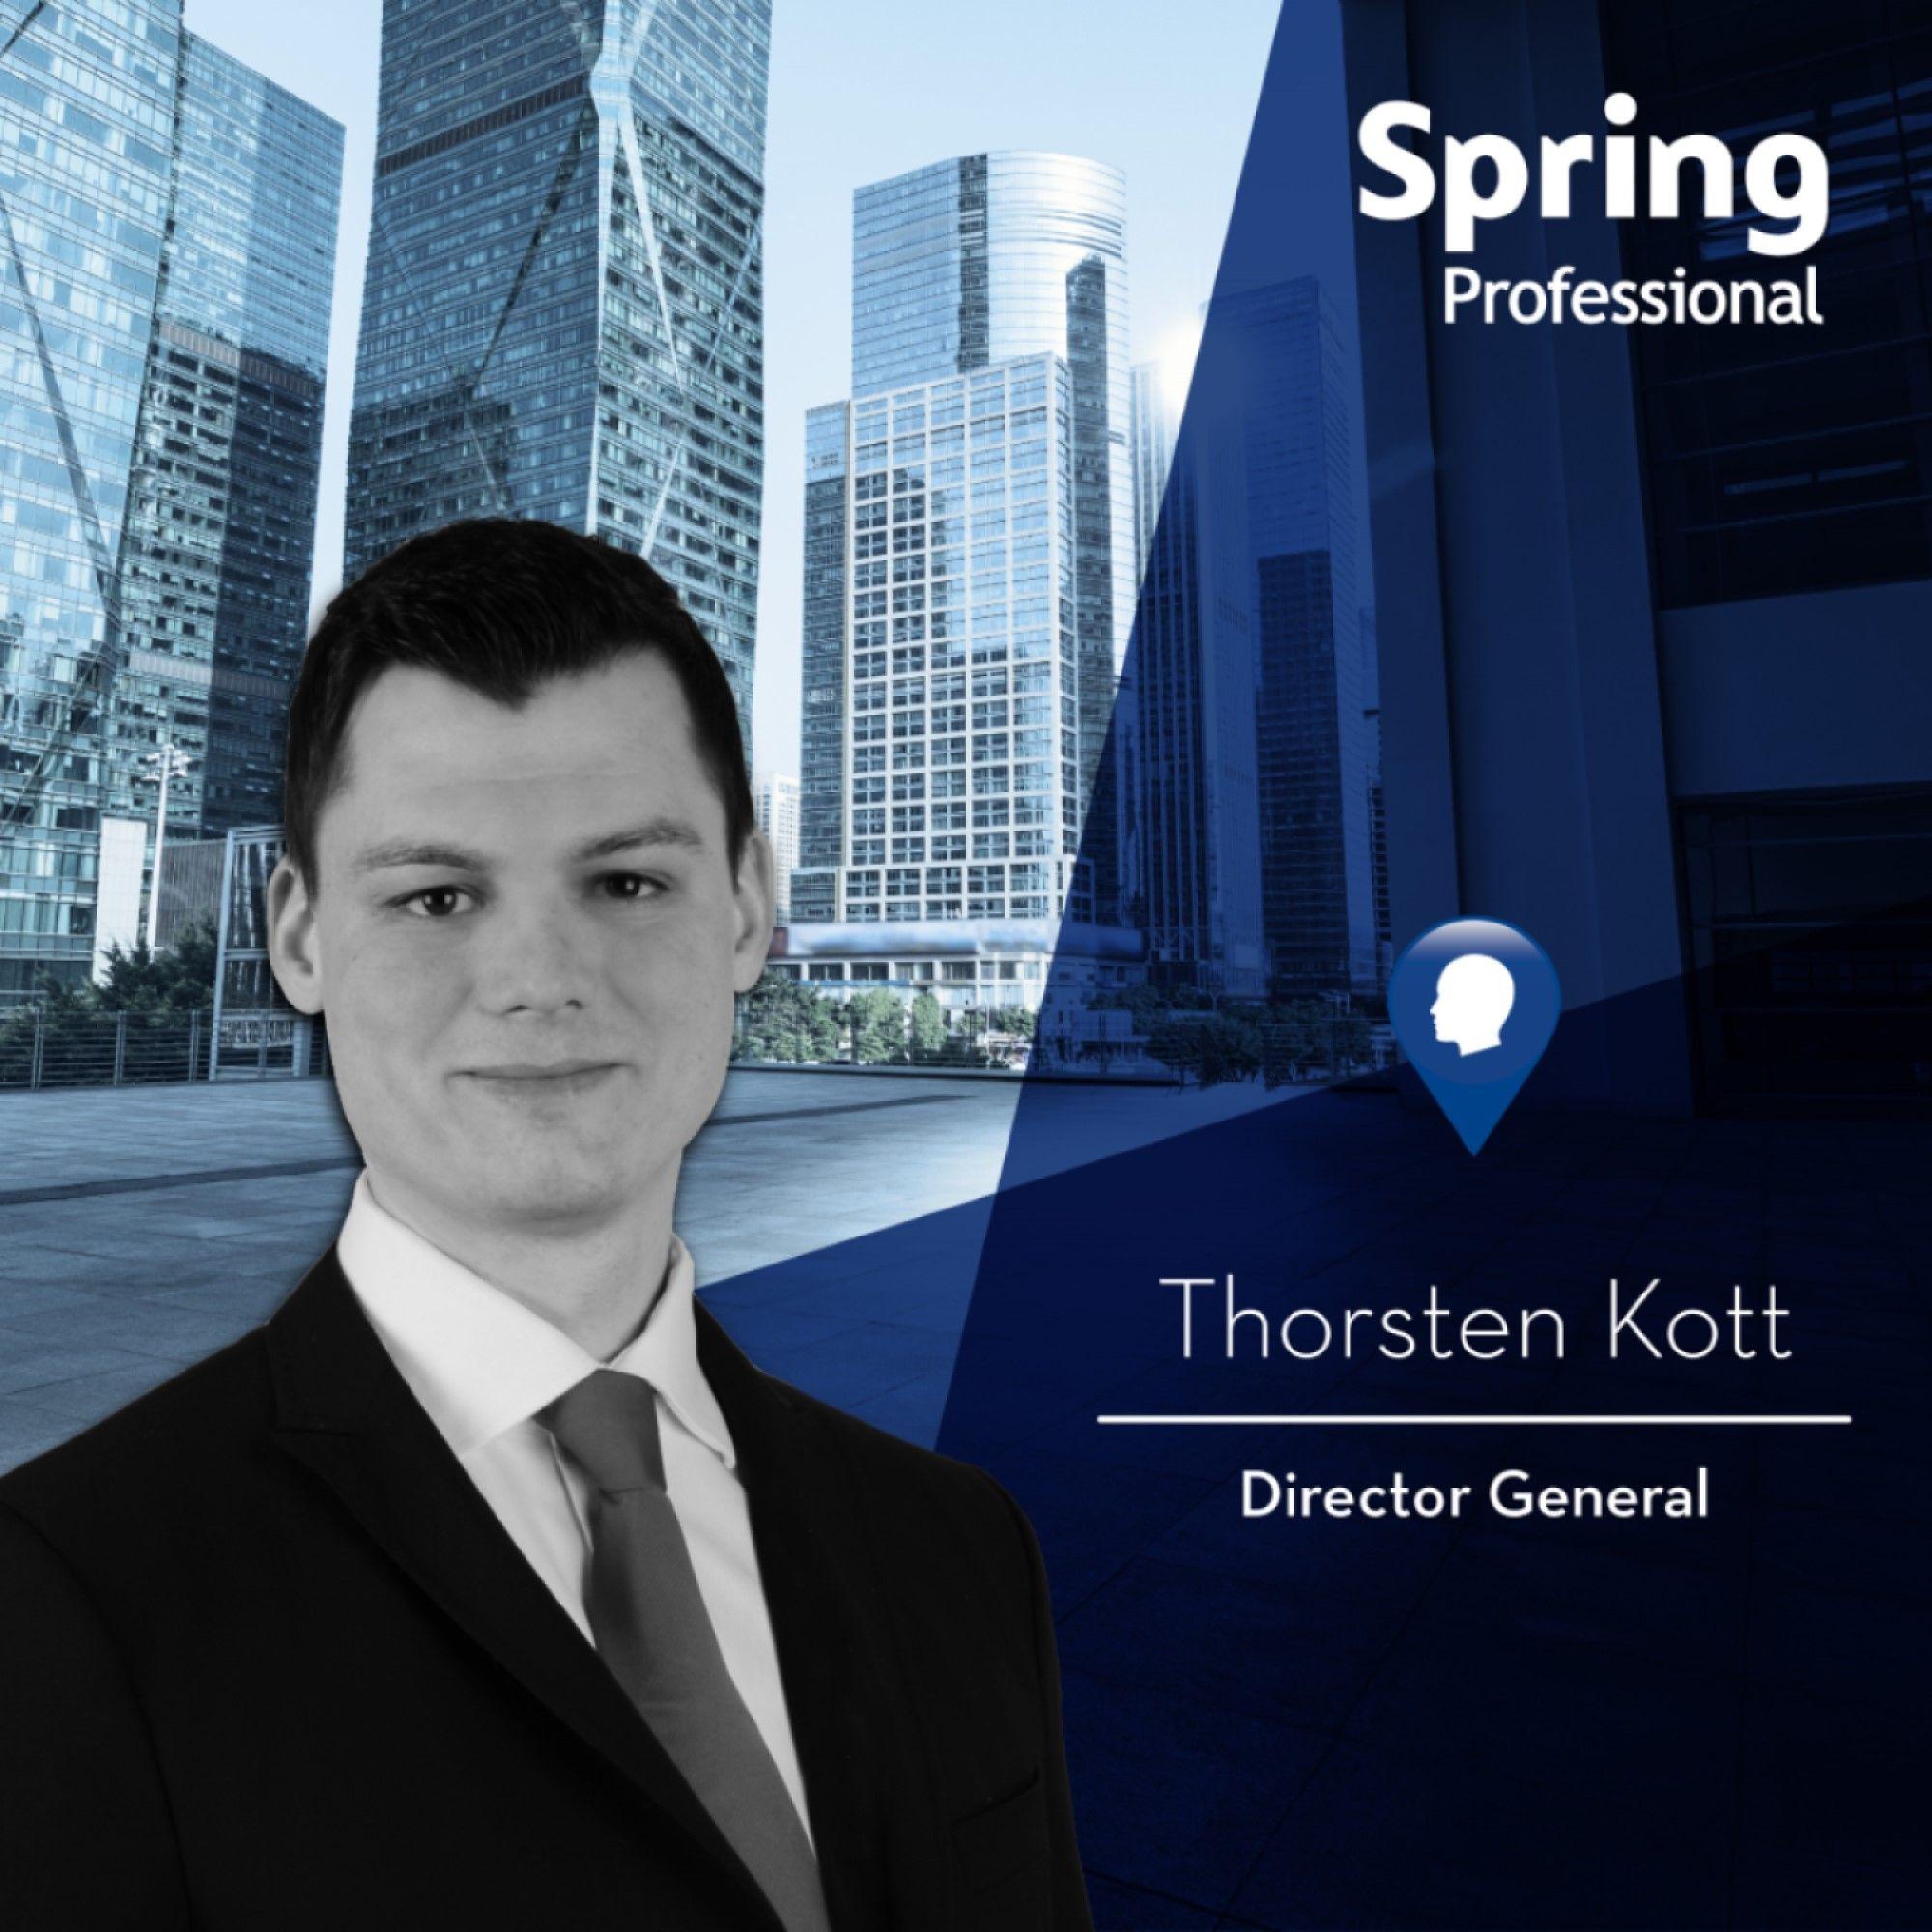 Fotografia Thorsten Kott, Director General. Spring Professional